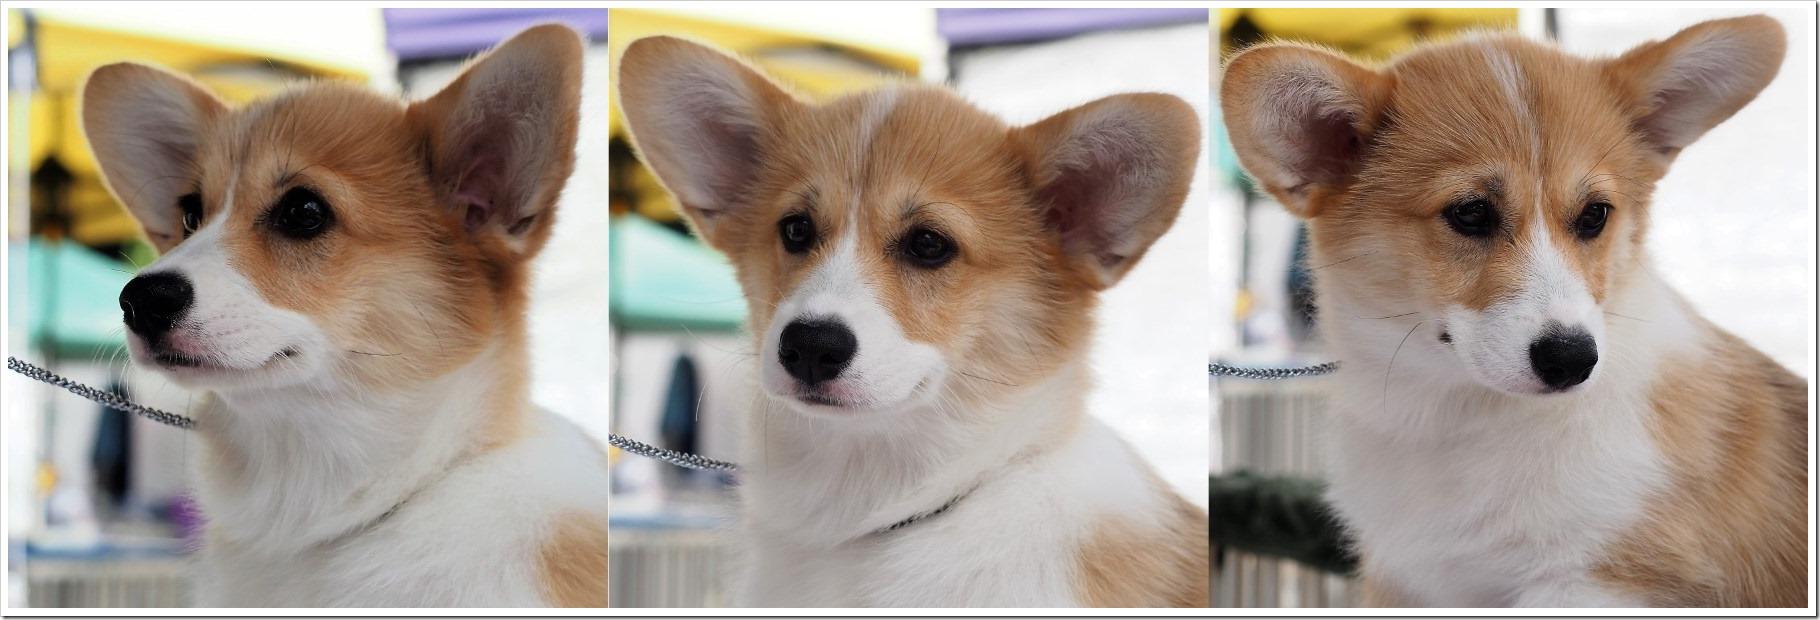 Pembroke Puppy - Lang Lang